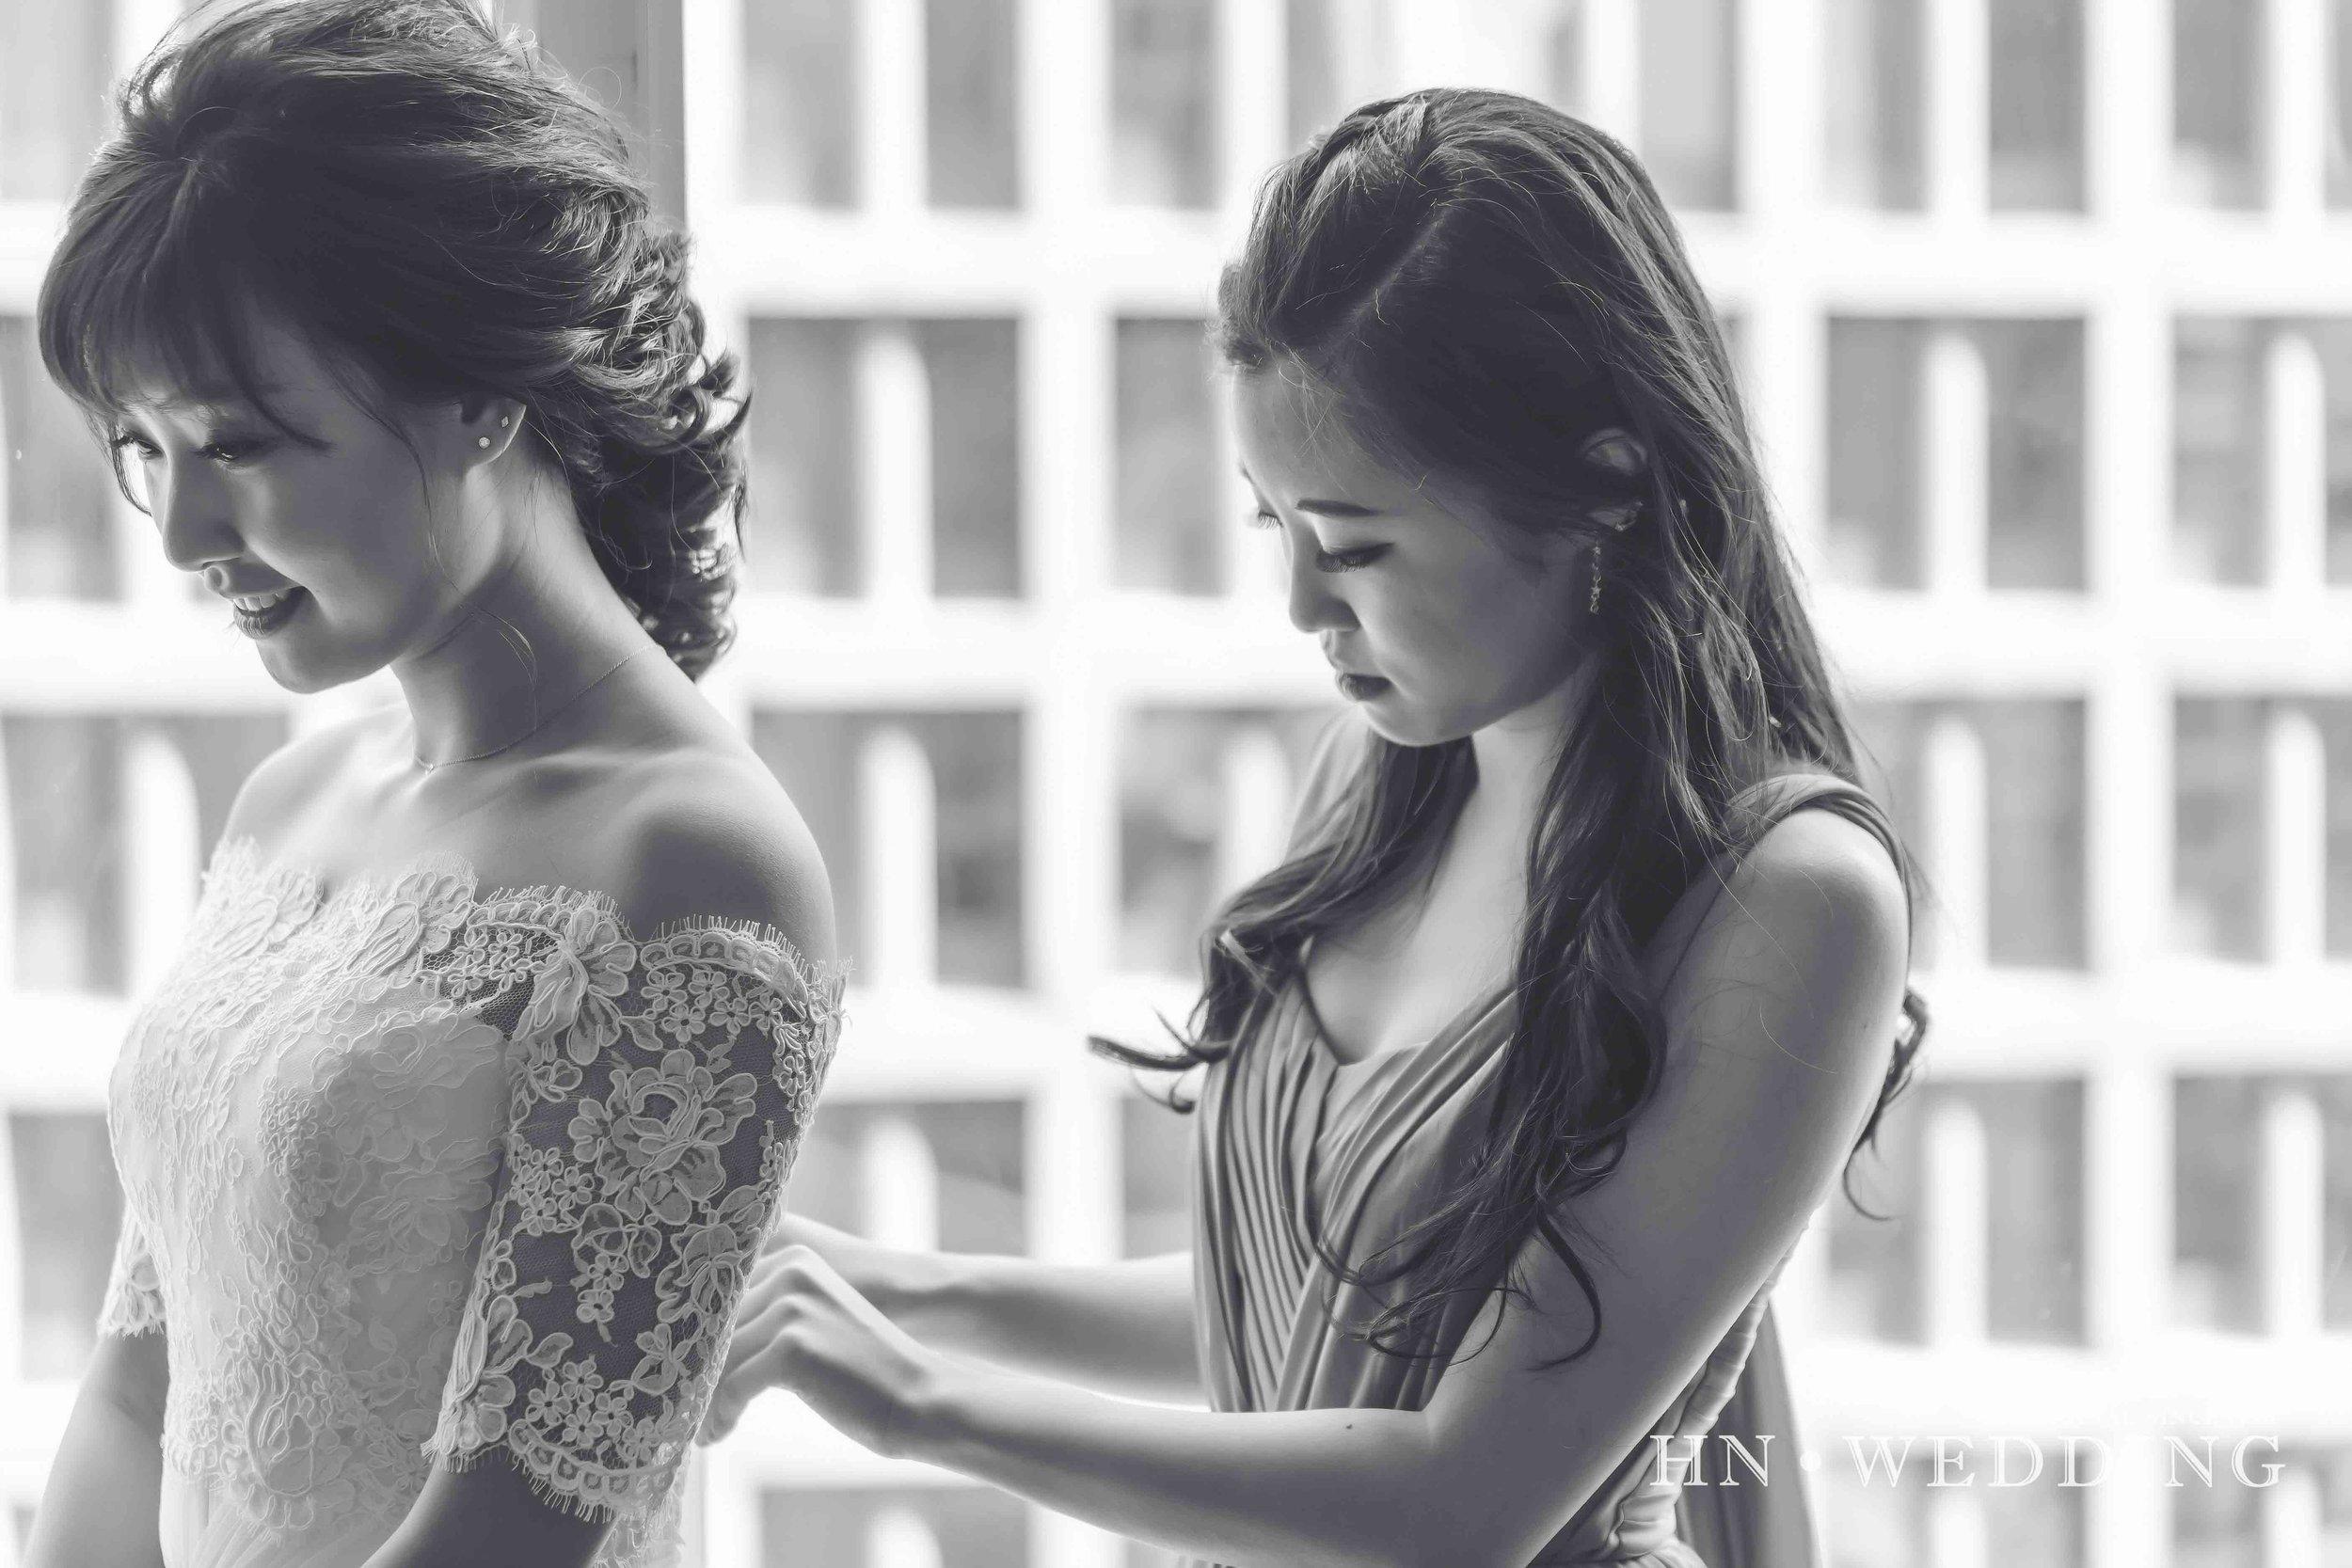 HNwedding-20160826-wedding-1225.jpg